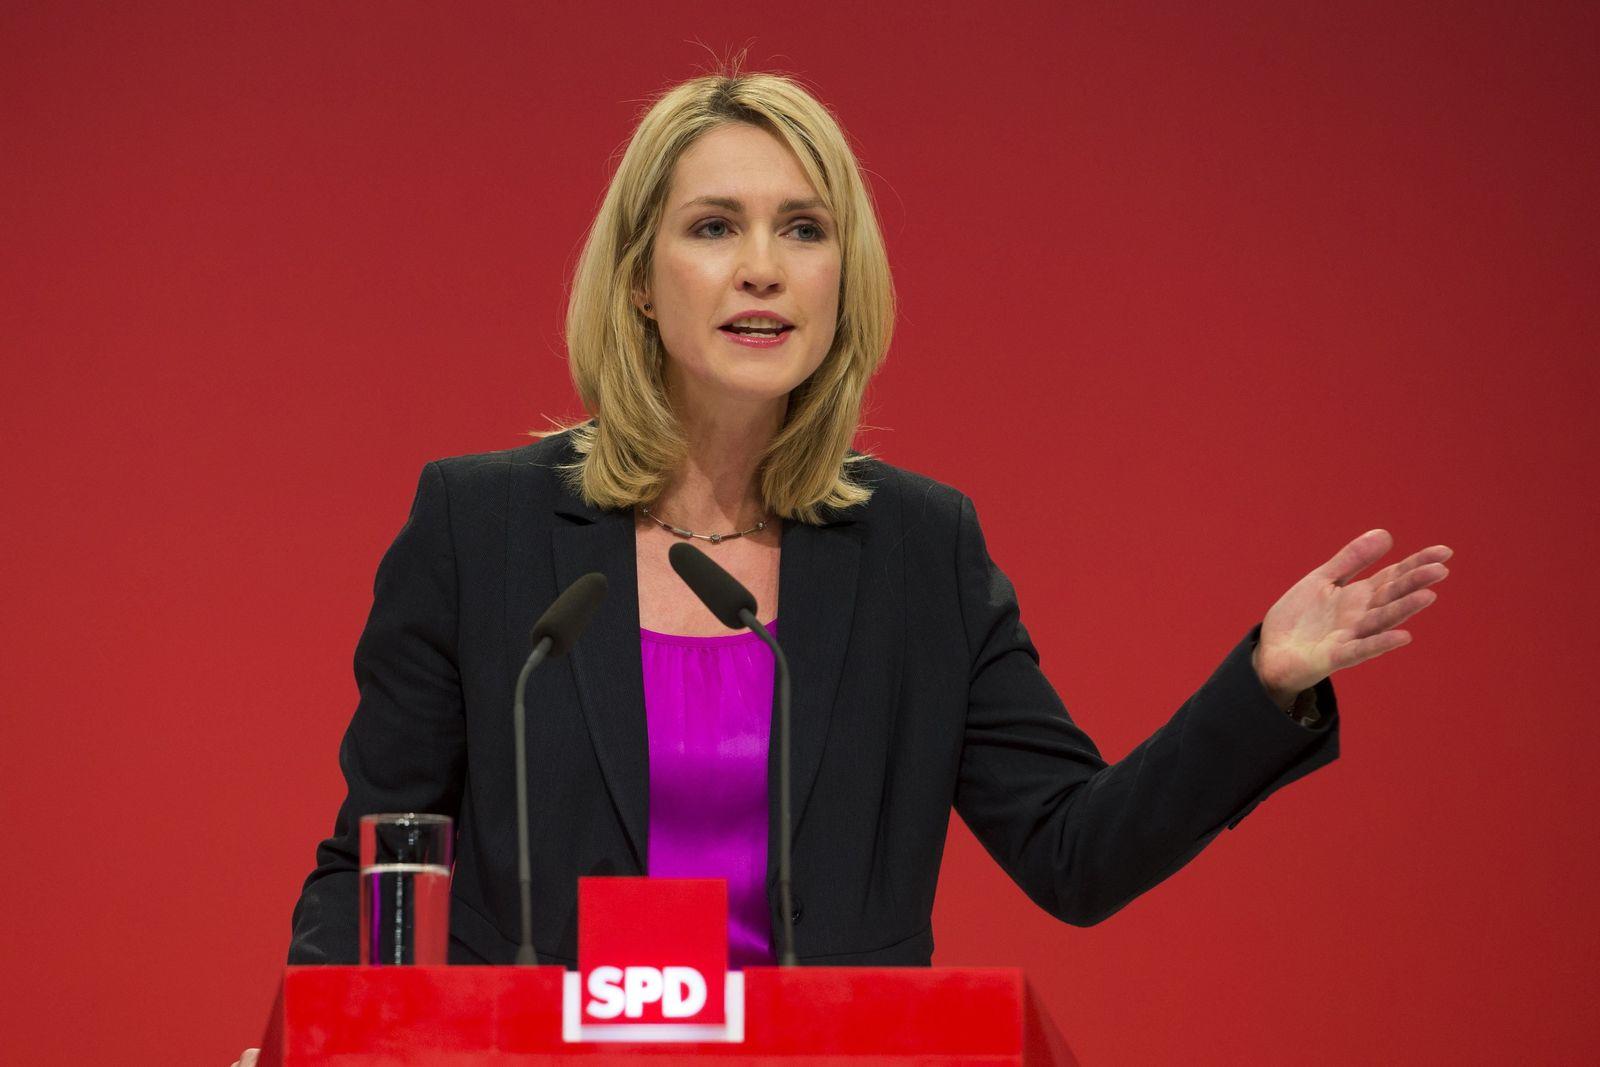 GERMANY-SPD/